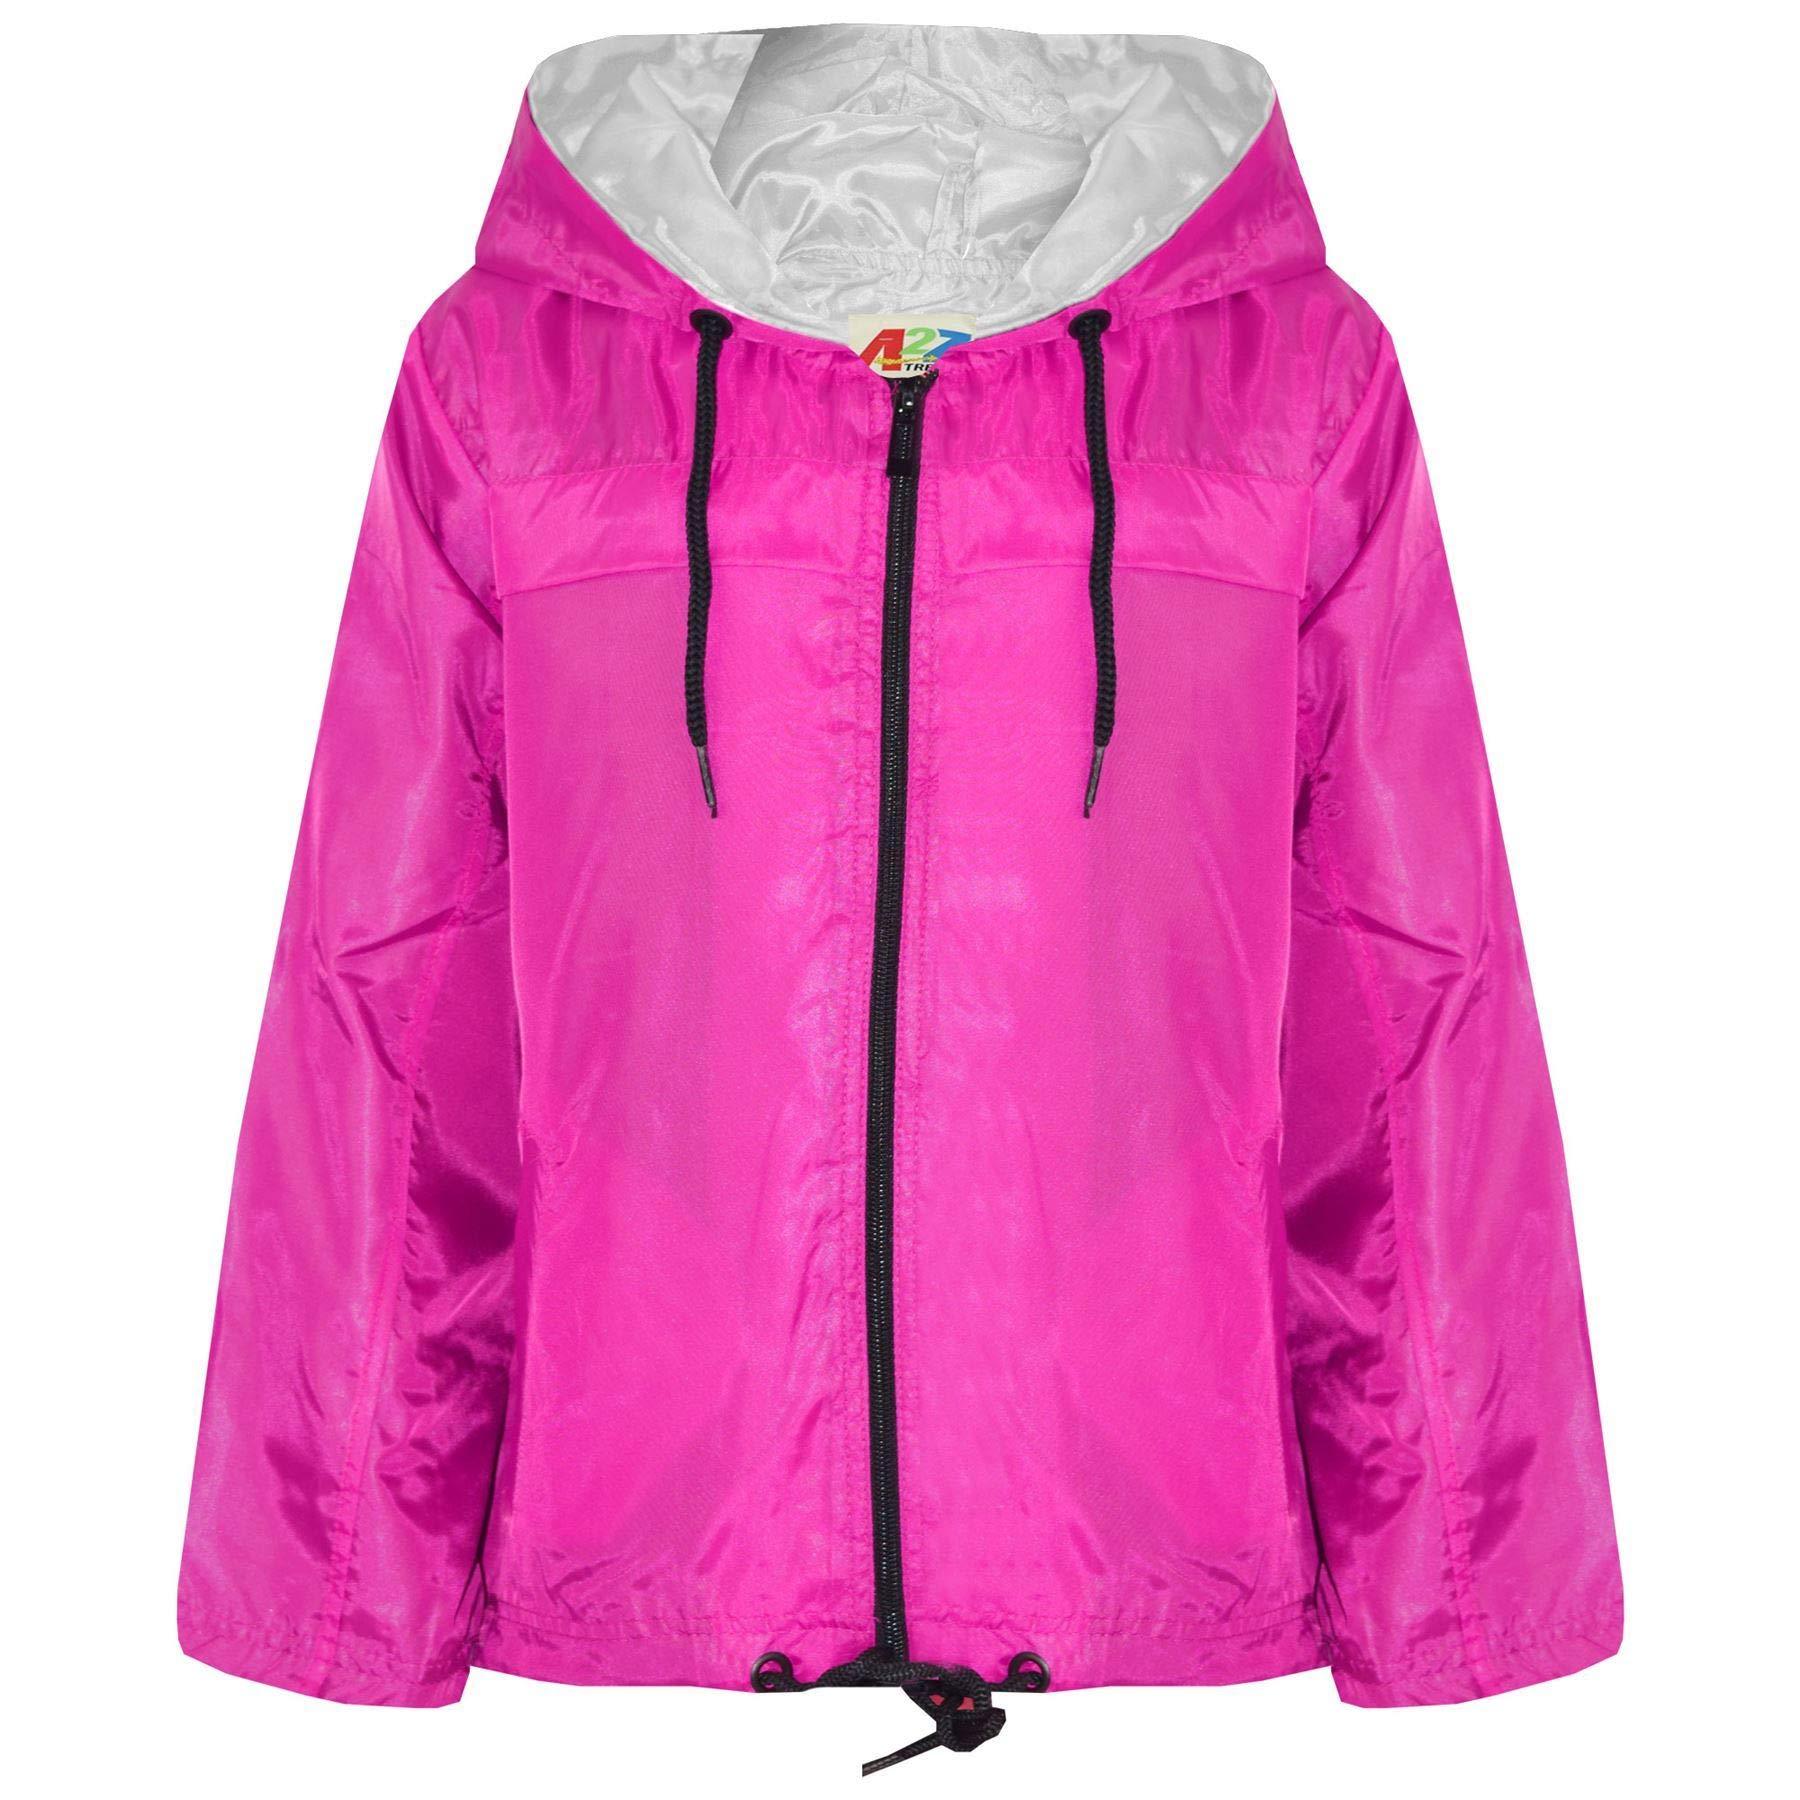 Kids Girls Boys Pink Hooded Raincoats Cagoule Lightweight Jackets Rain Mac 5-13